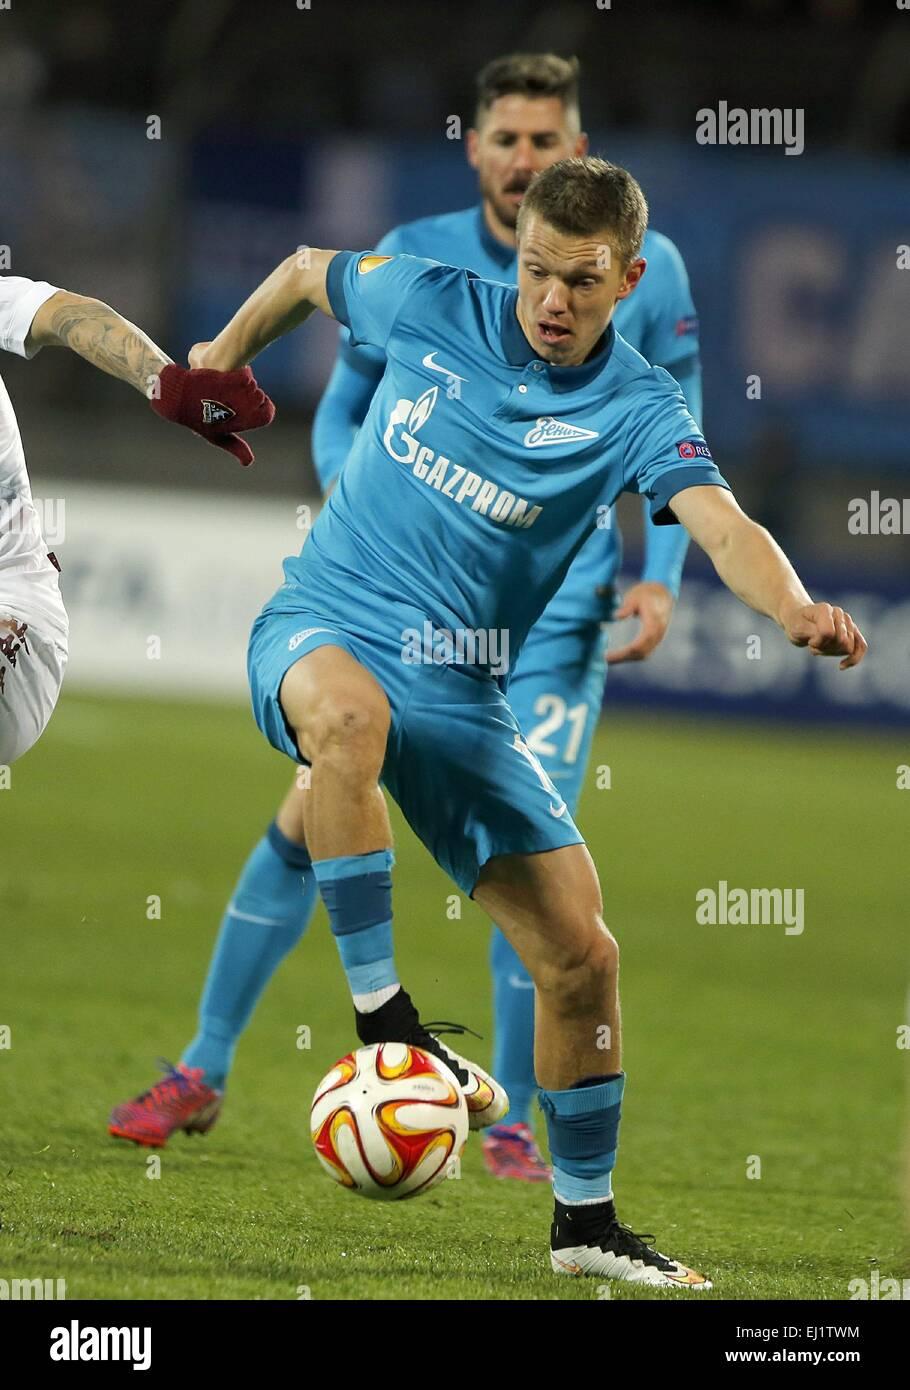 752ee116 Europa League 2014/15. 1/8 final. FC Zenit San Petersburgo vs Torino F.C.,  2:0. En la foto: FC Zenit player Oleg Shatov (17).